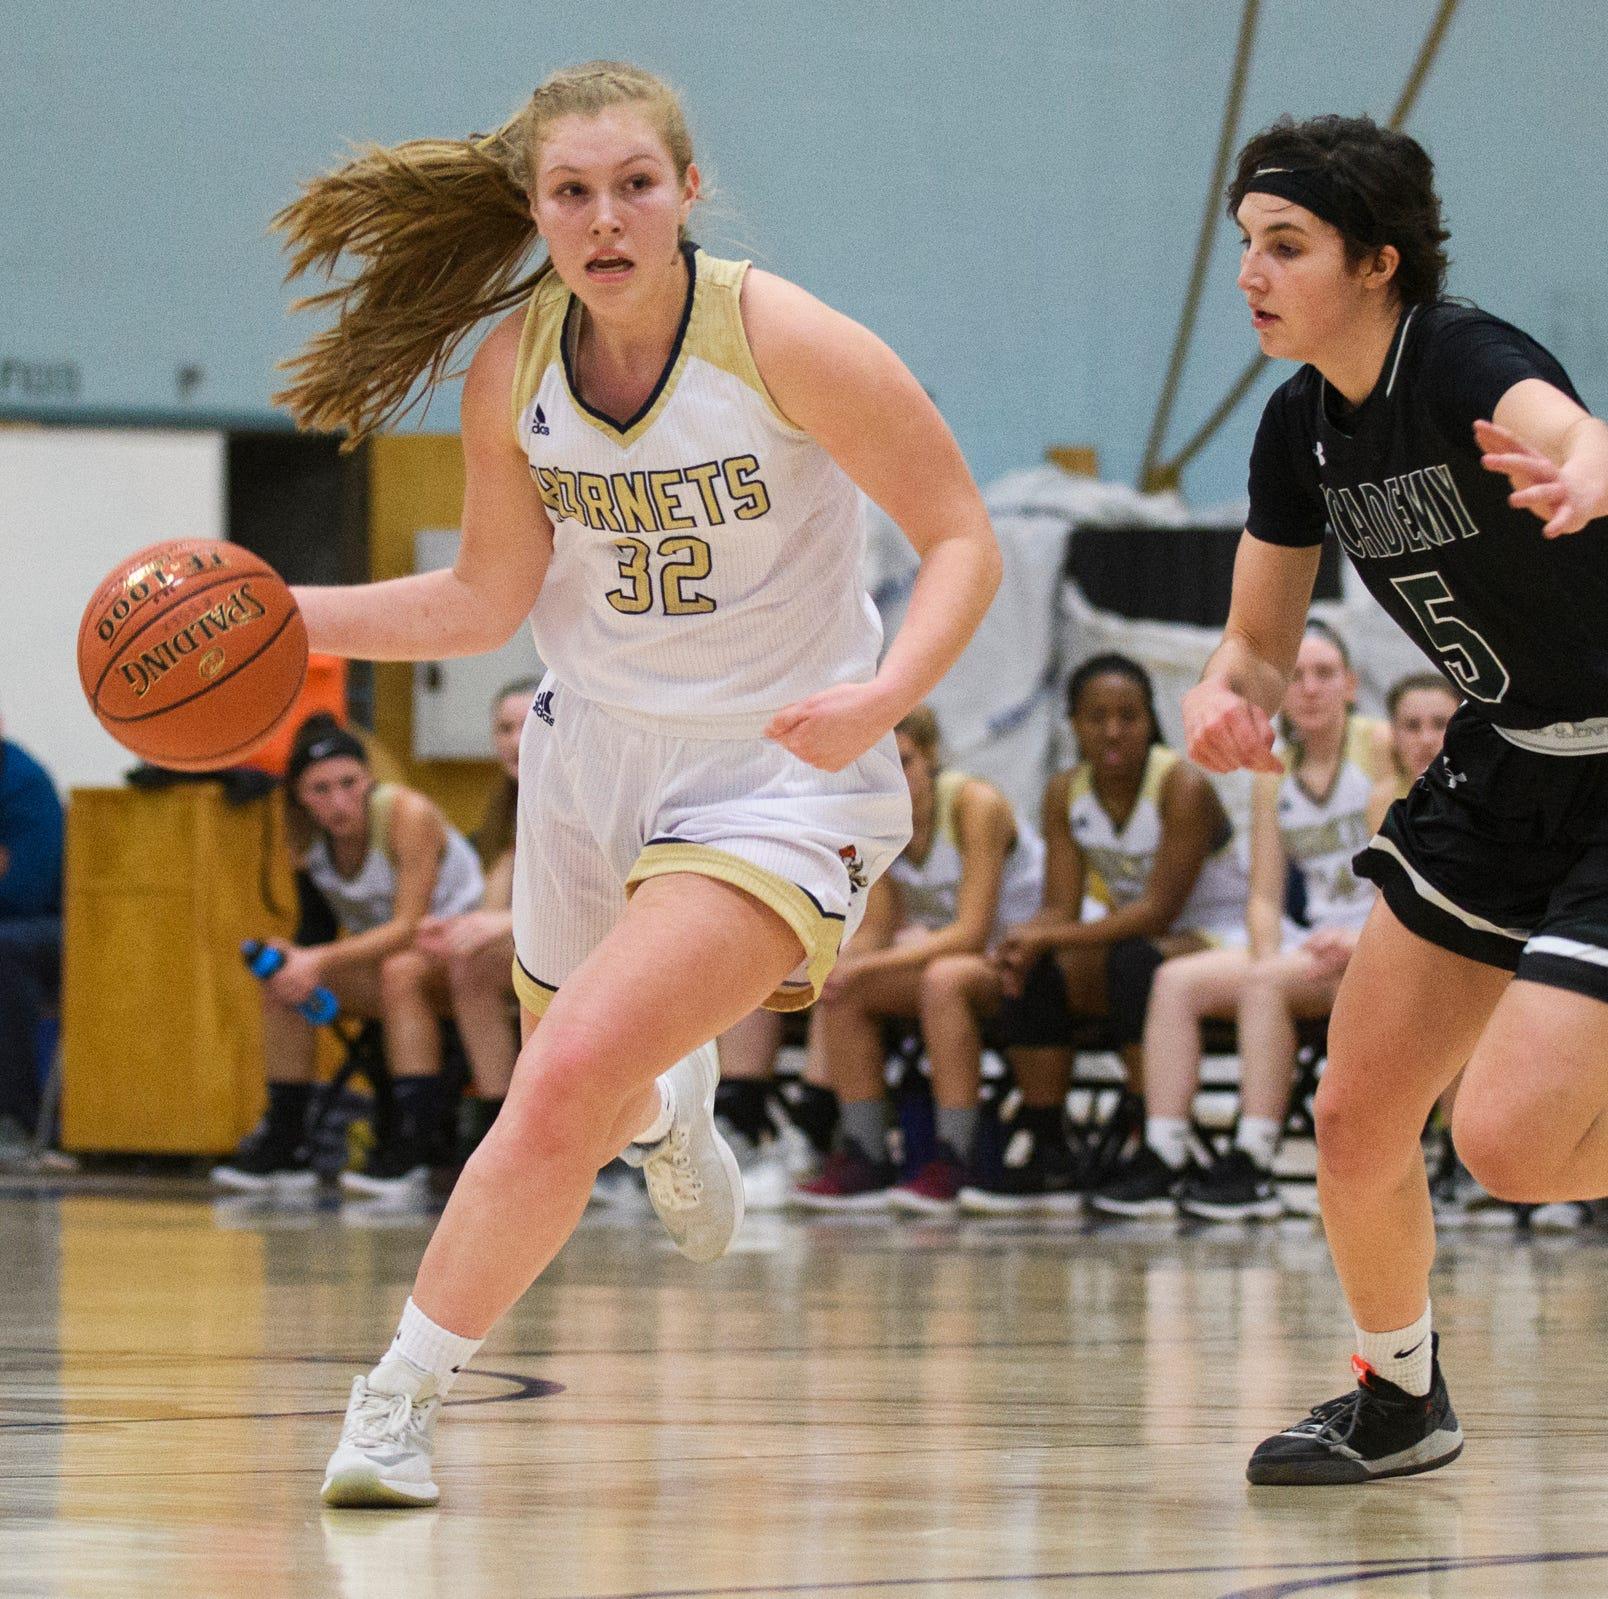 Monday's H.S. highlights: Essex topples Burlington in girls basketball